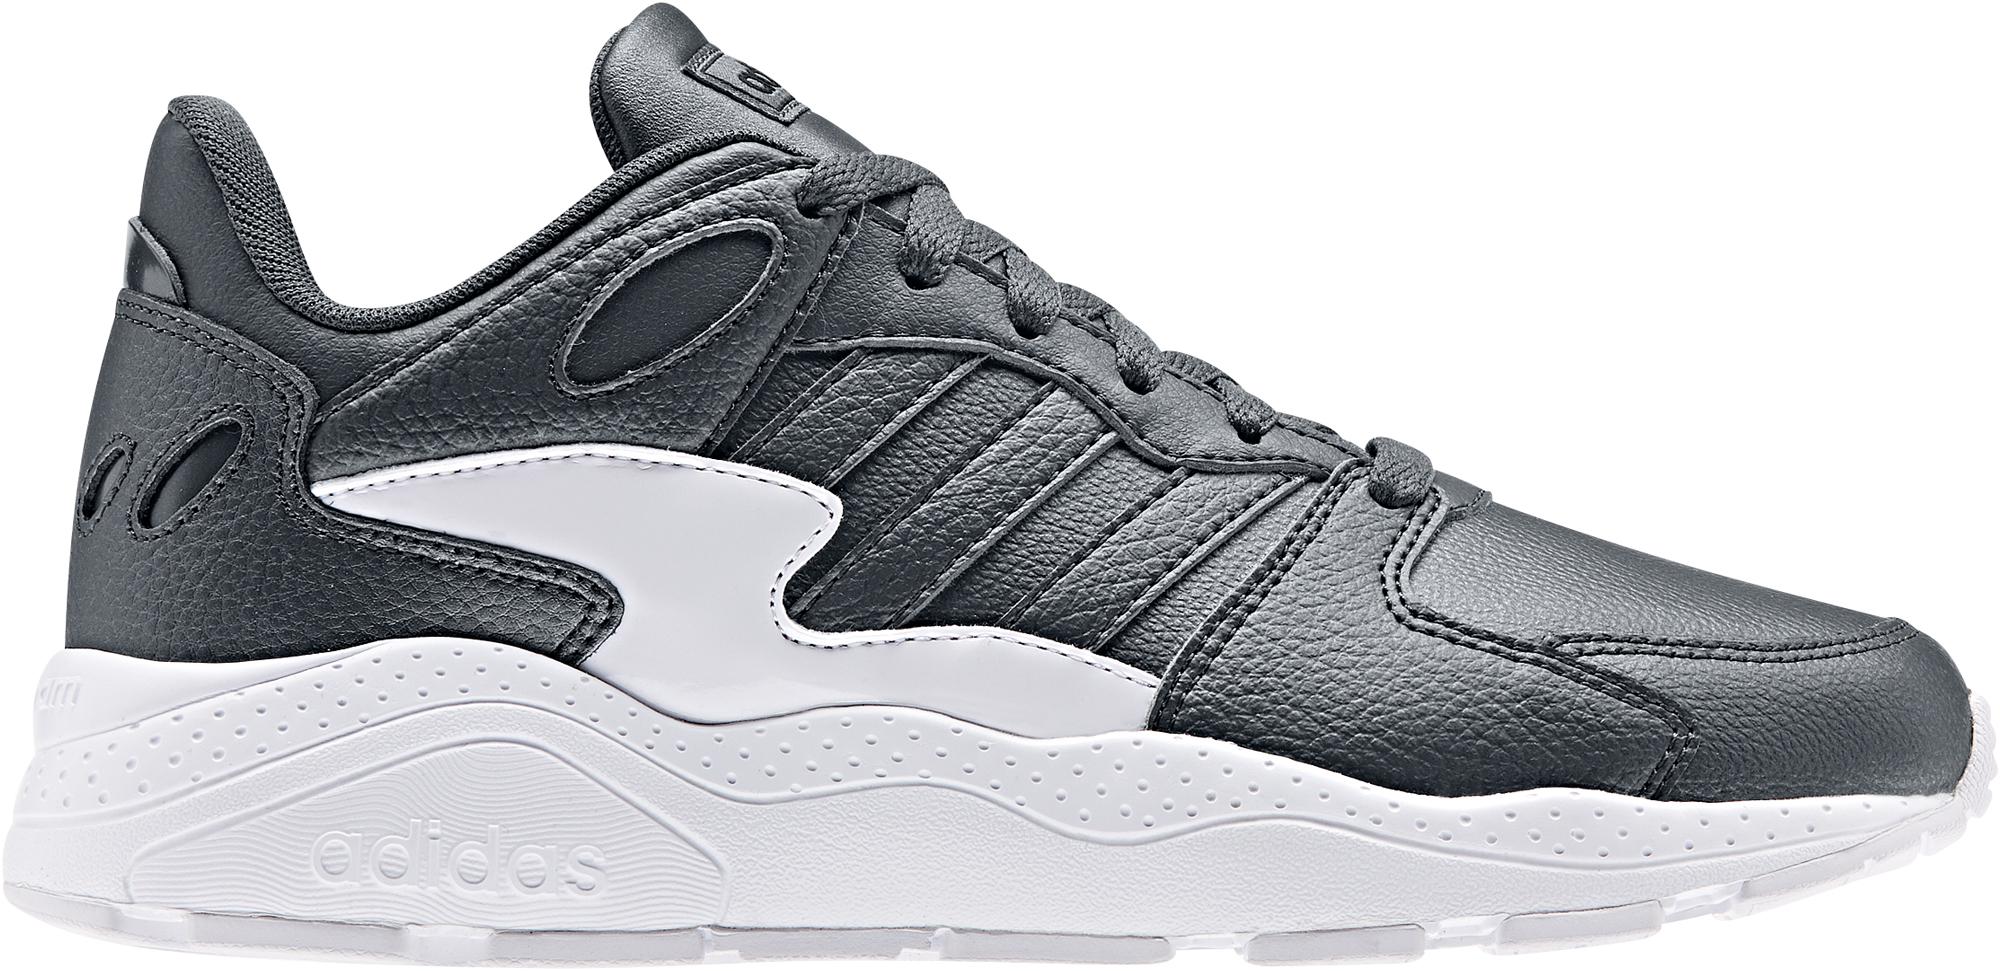 Adidas Кроссовки женские CHAOS, размер 36,5